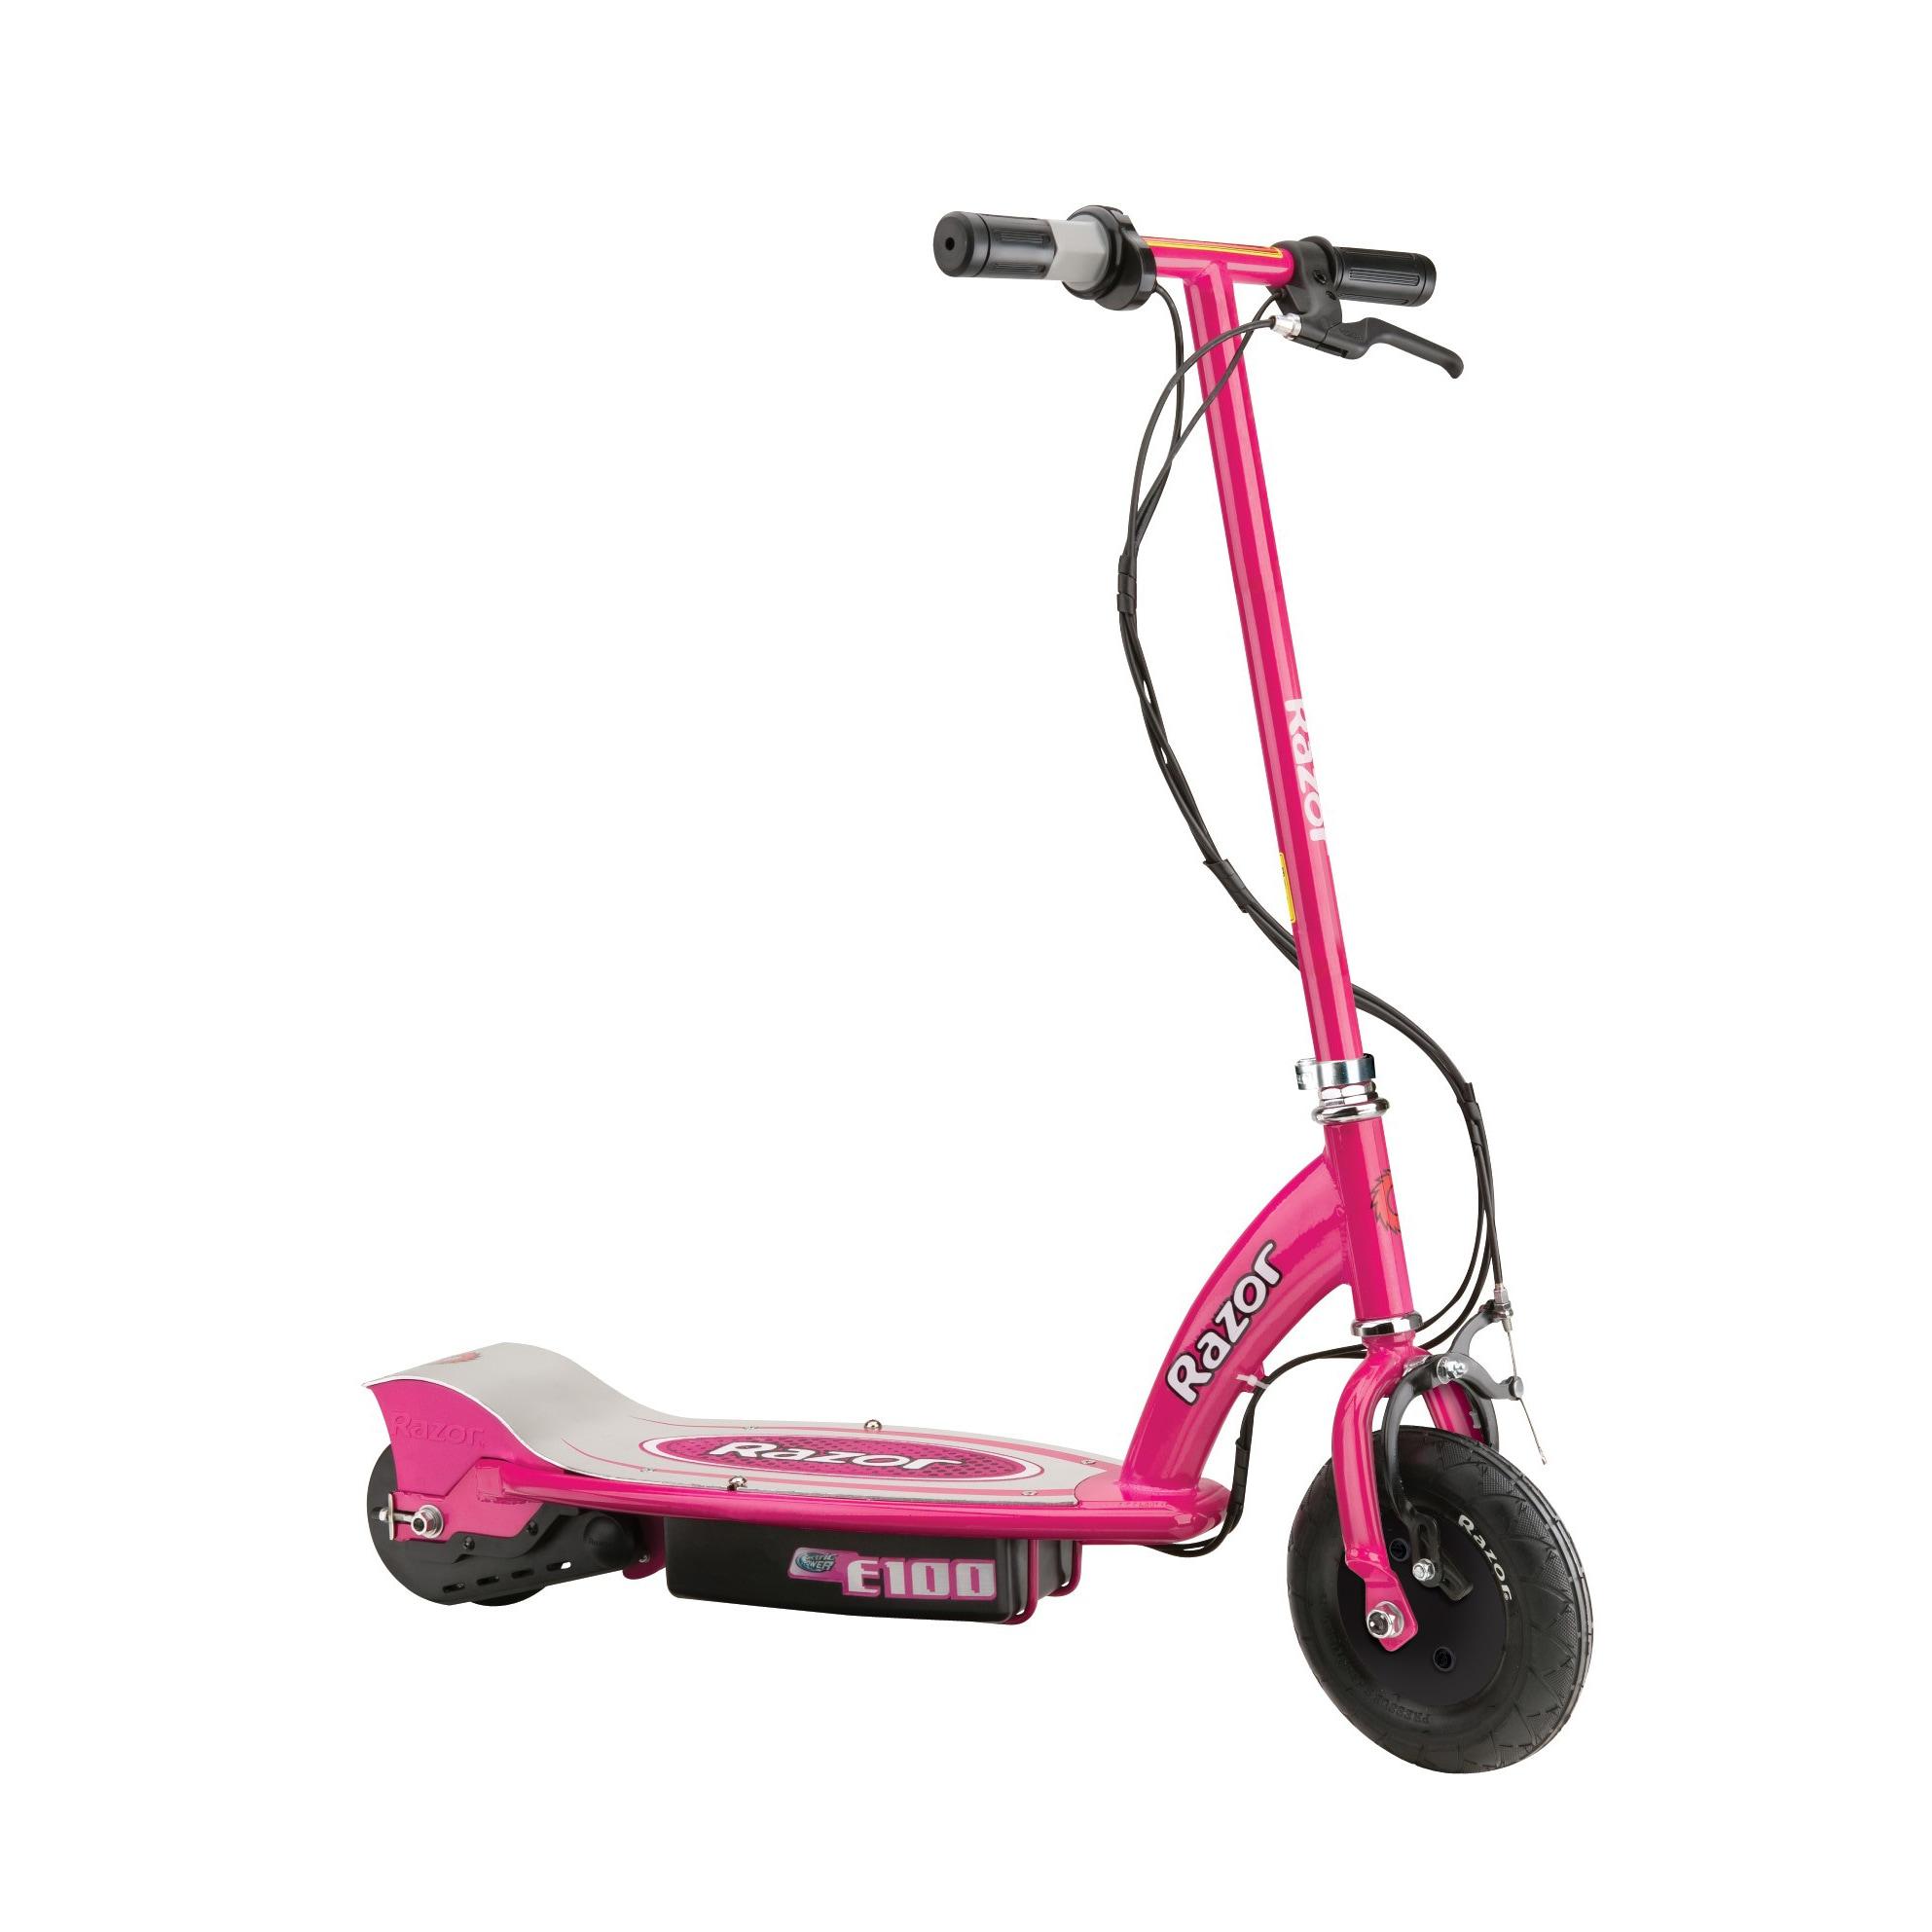 Razor Pink E100 Electric Scooter (E100 - Pink)